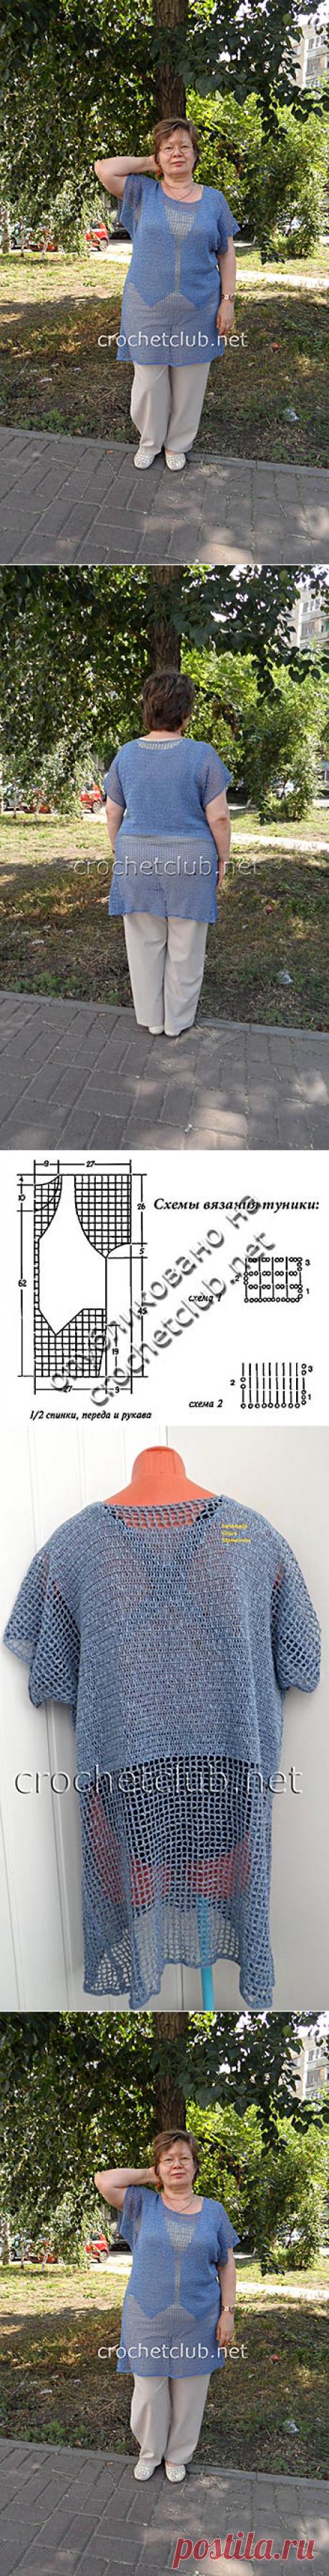 Вязаная туника цвета «Джинс» - Вязание Крючком. Блог Настика